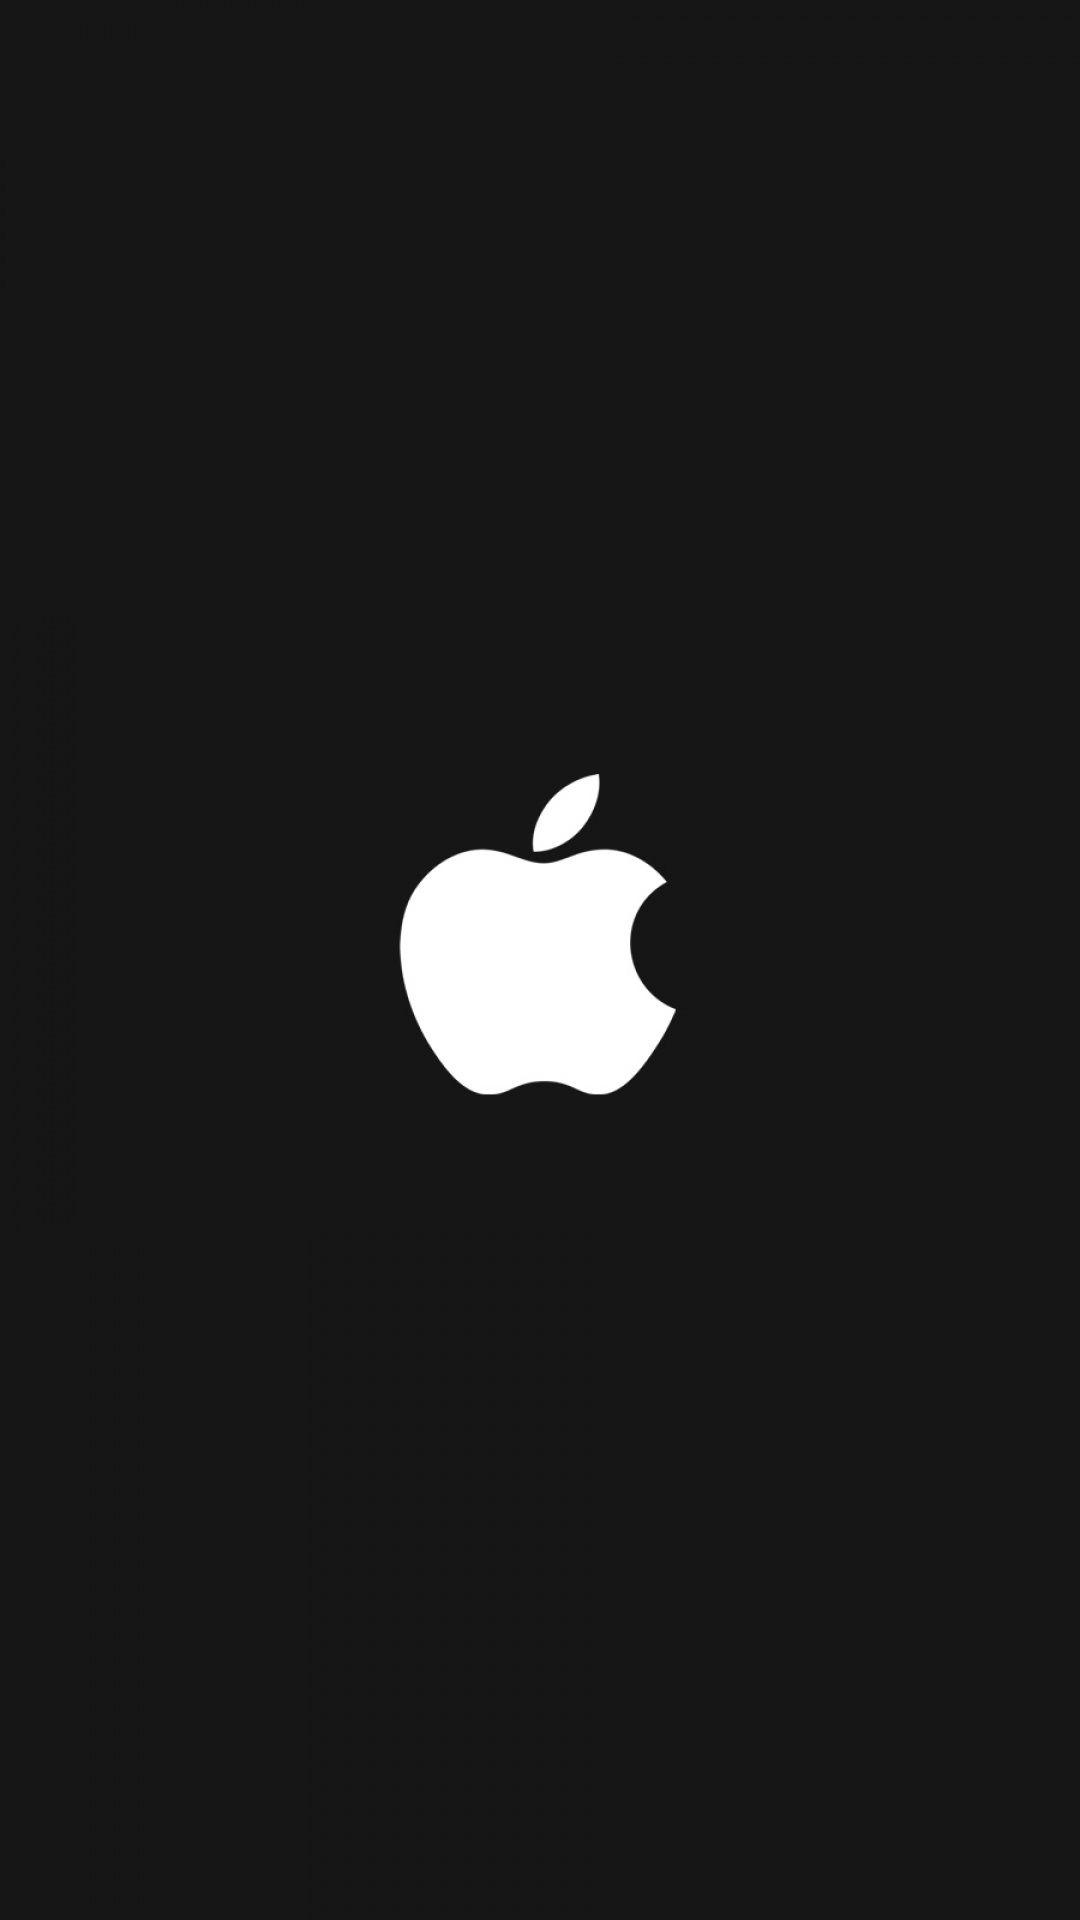 Wallpaper iphone apple logo - B W Quenalbertini Apple Logo Iphone Wallpaper